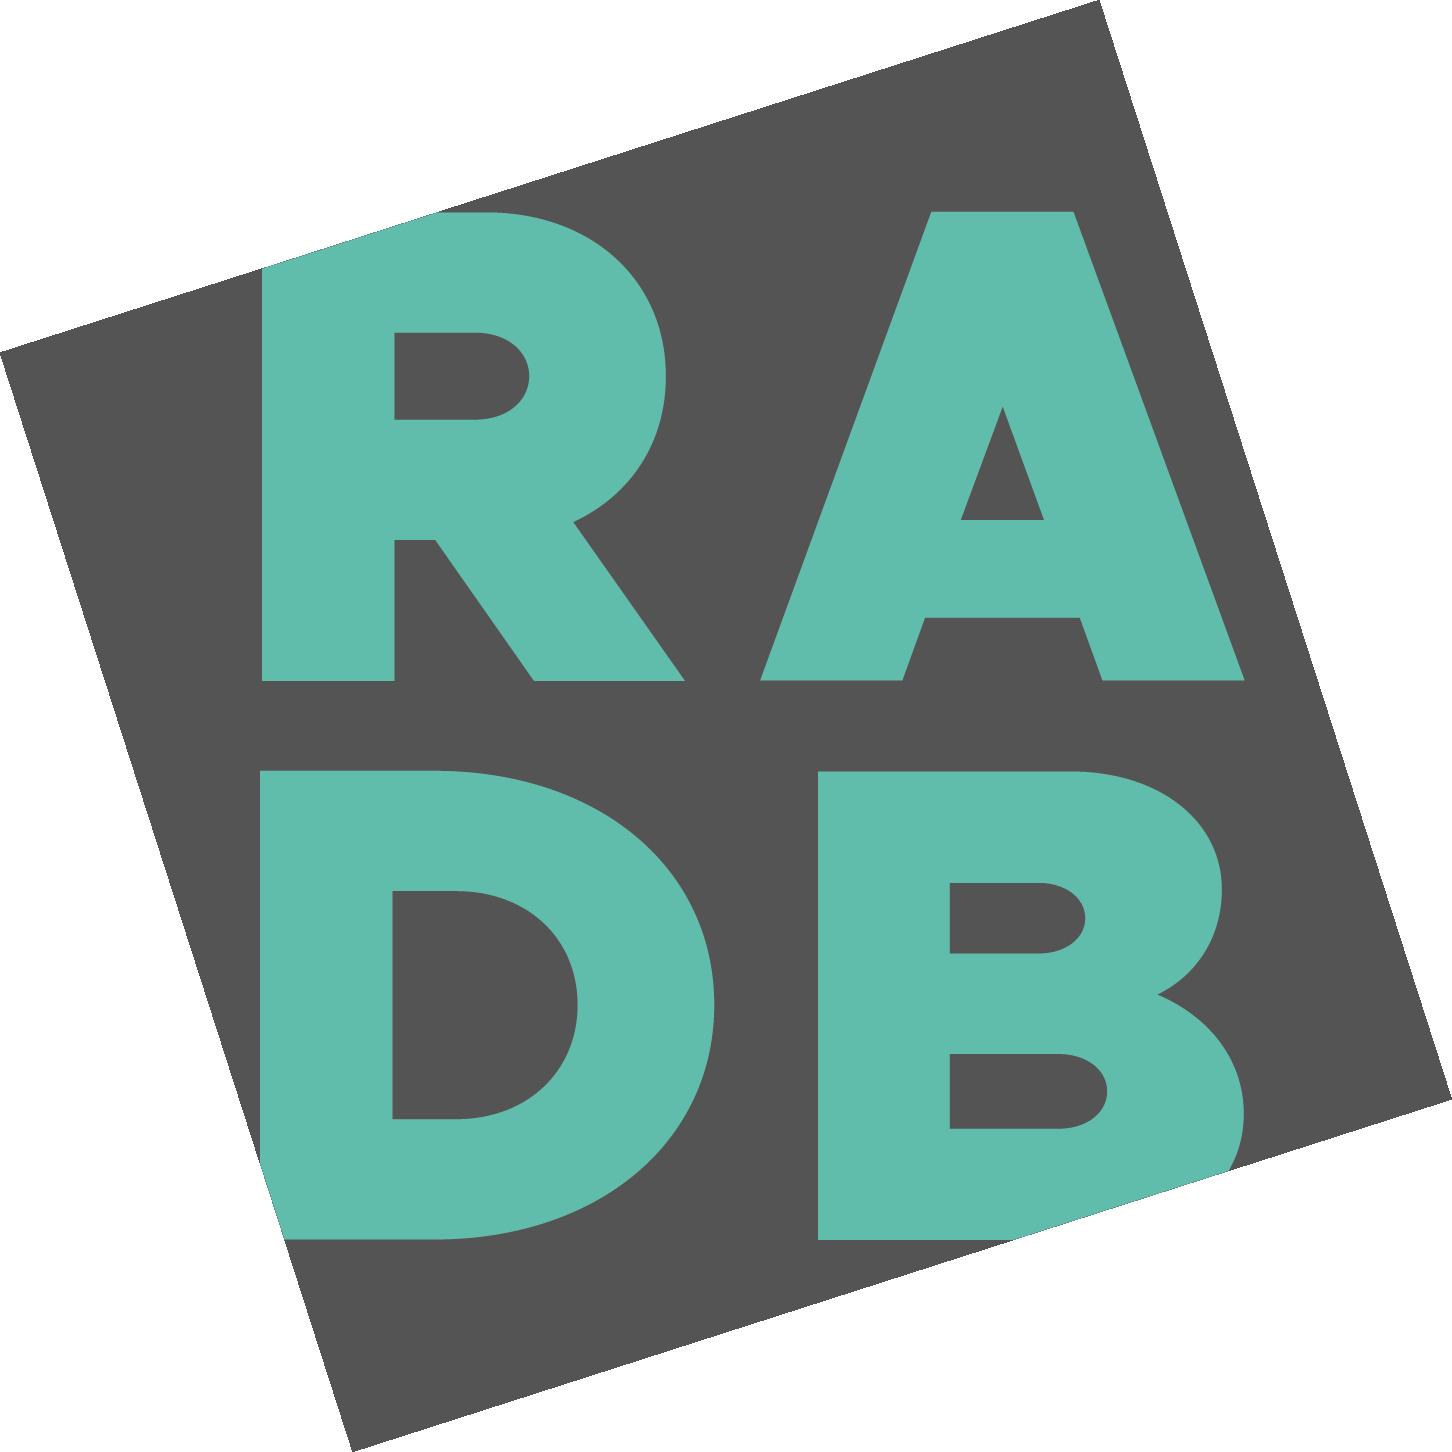 RADB Vloerisolatie